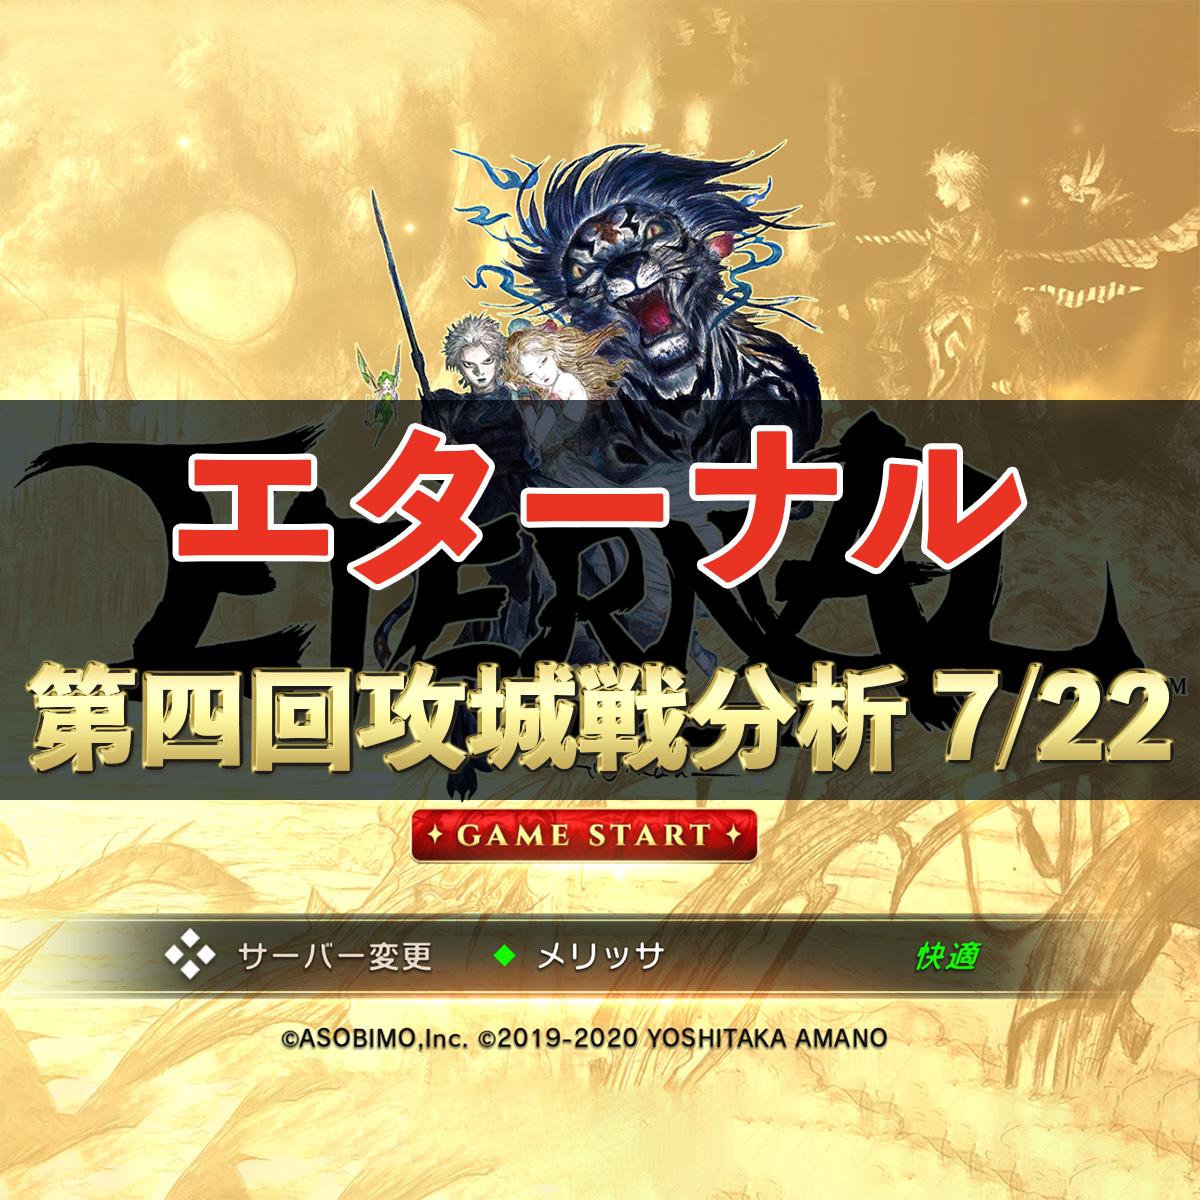 【エターナル】7/22調査! 第四回攻城戦 参加軍団徹底分析!